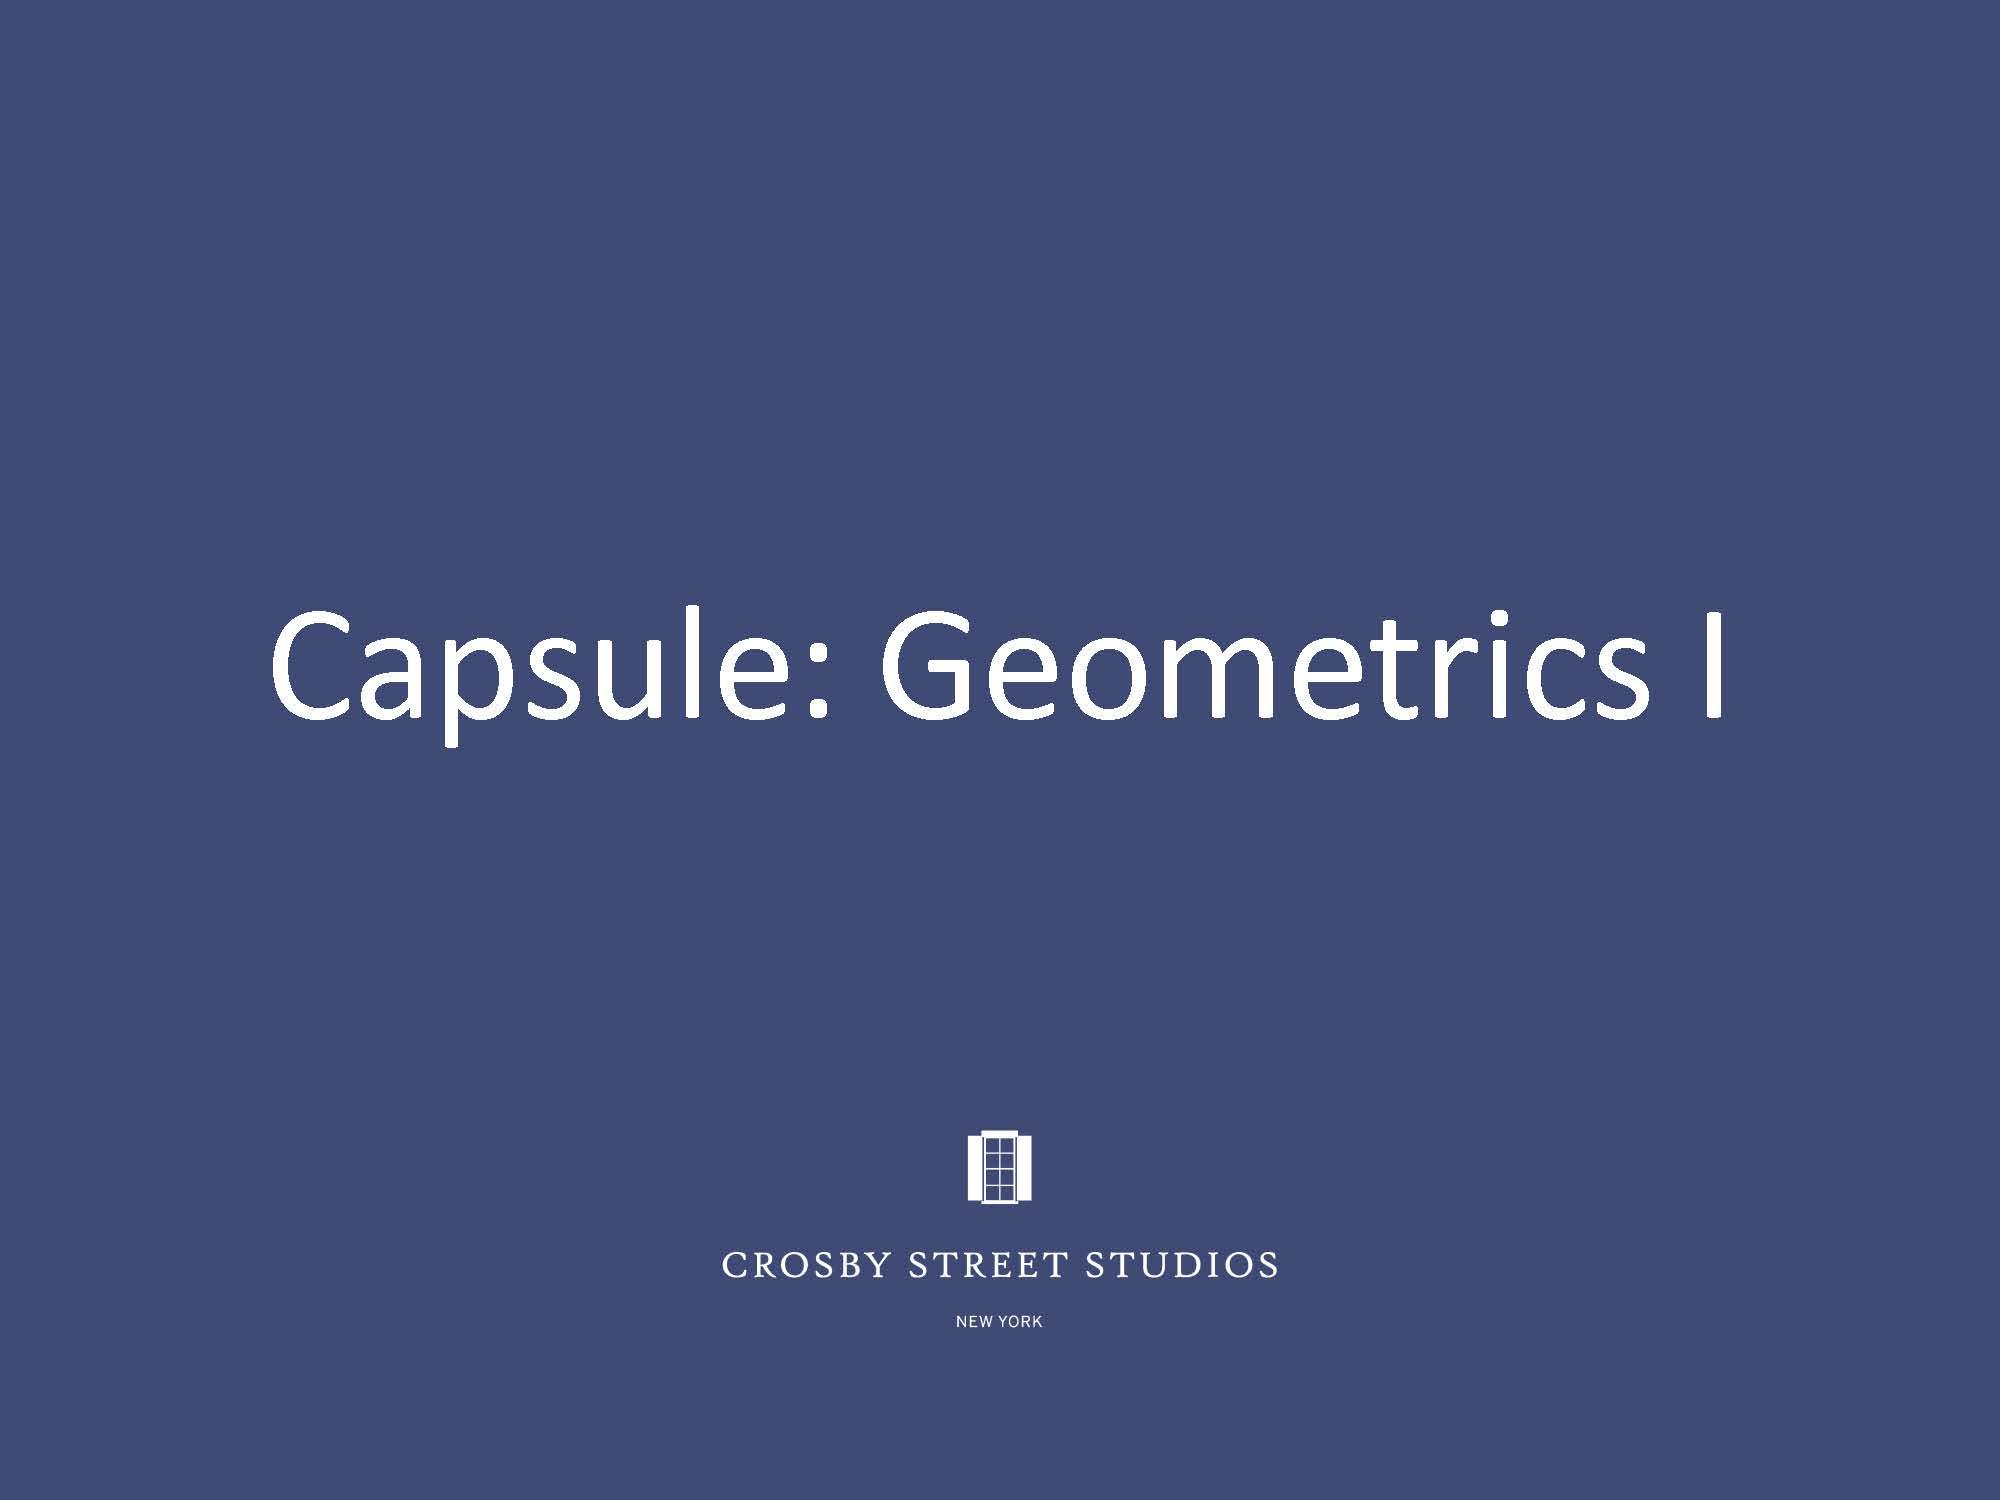 Crosby Street Studio Catalog_Capsule Geometrics I Cover